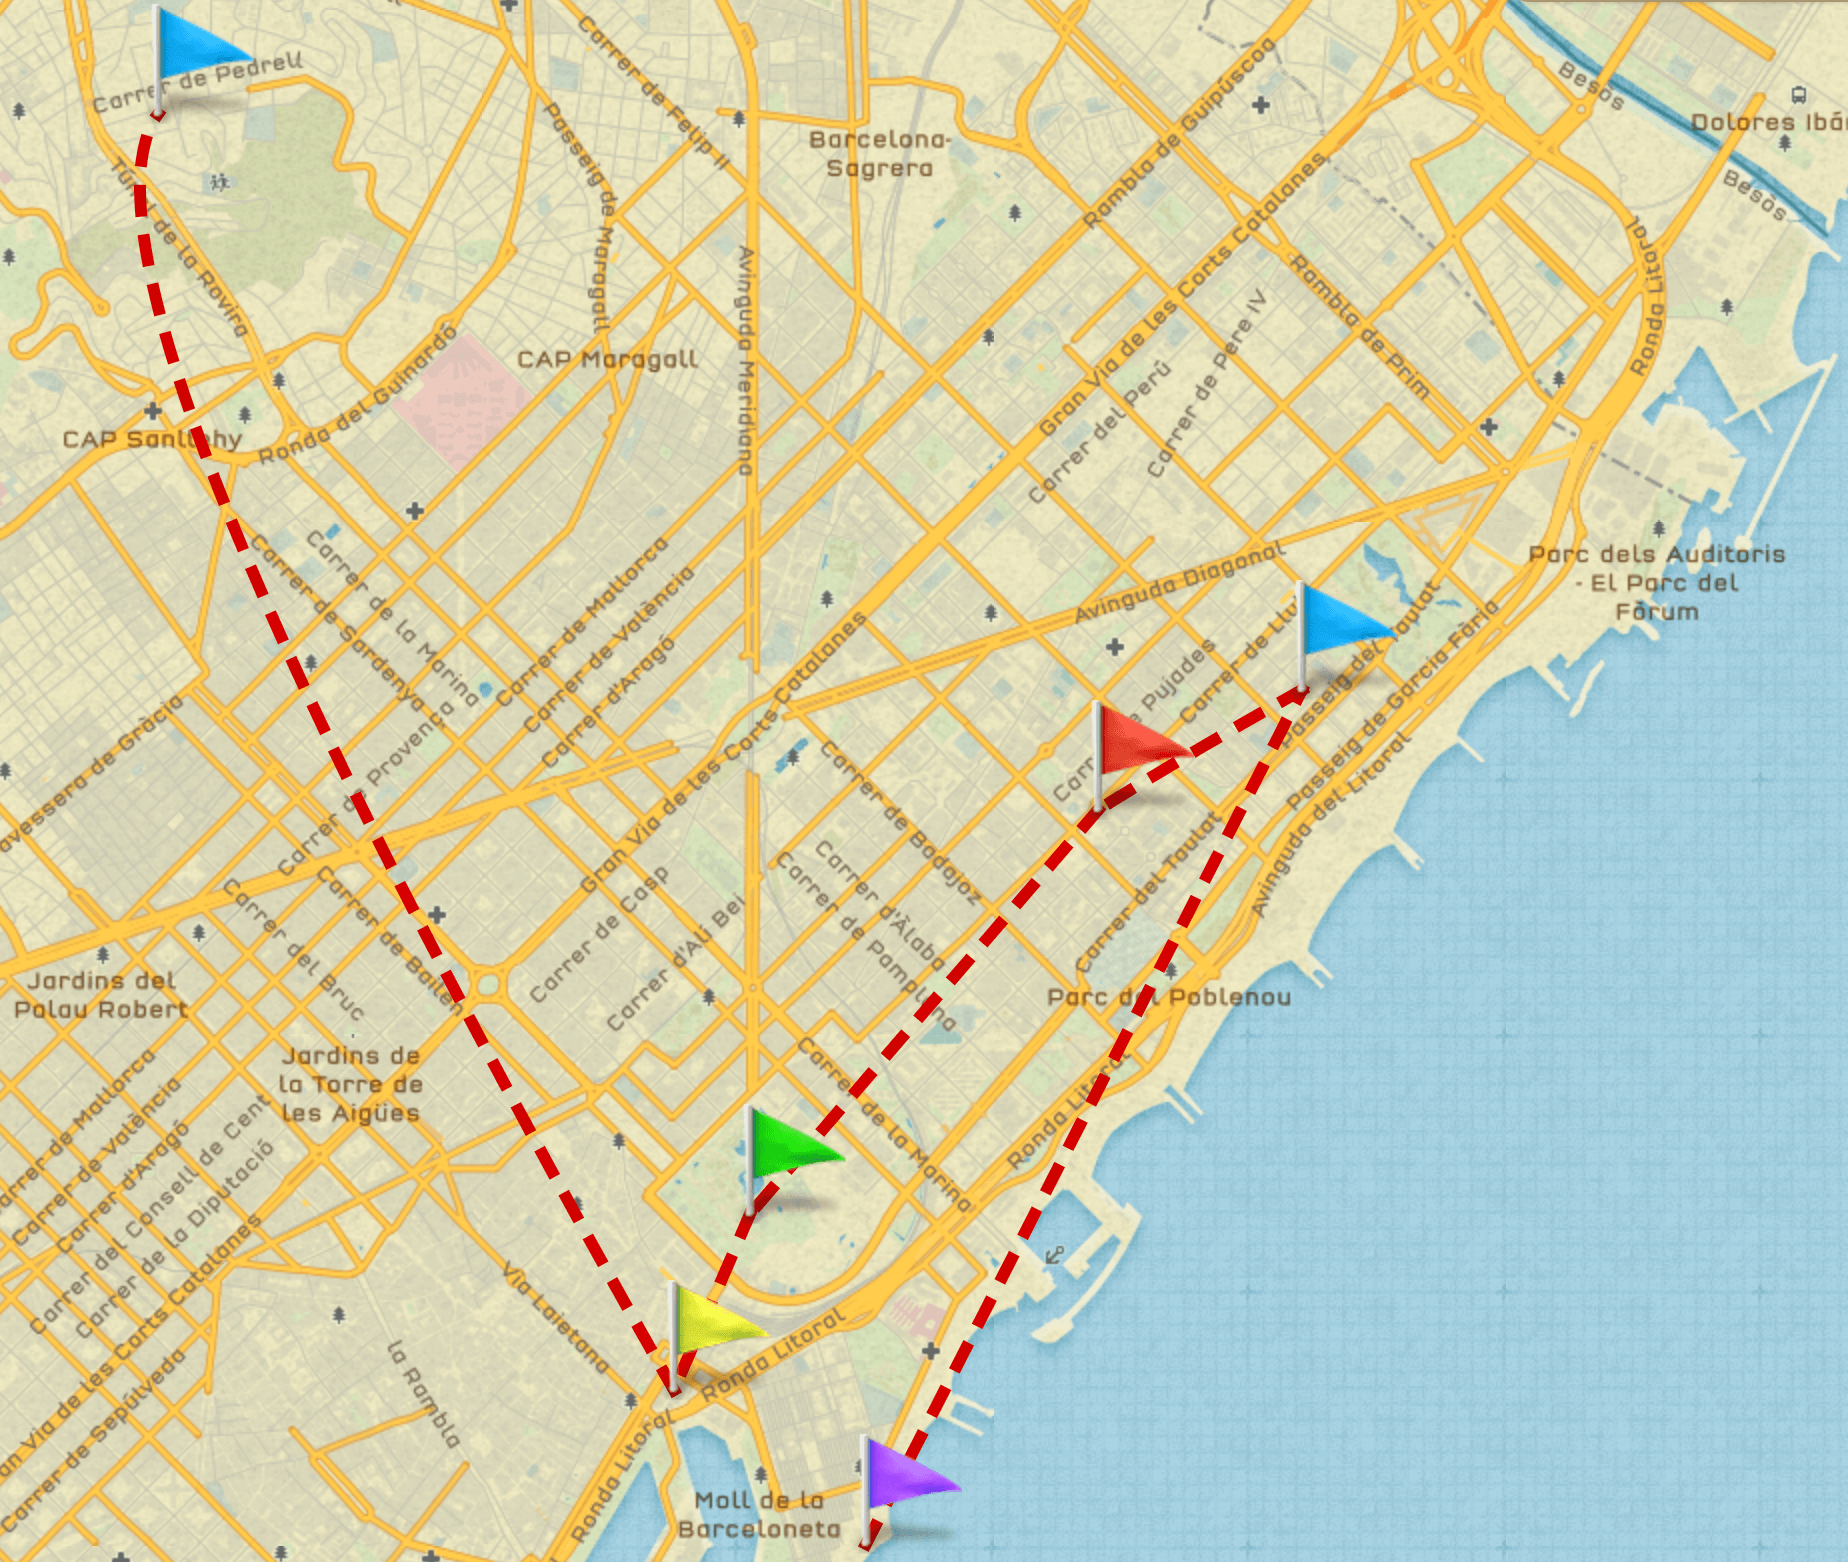 Barcelona Day 3 Itinerary